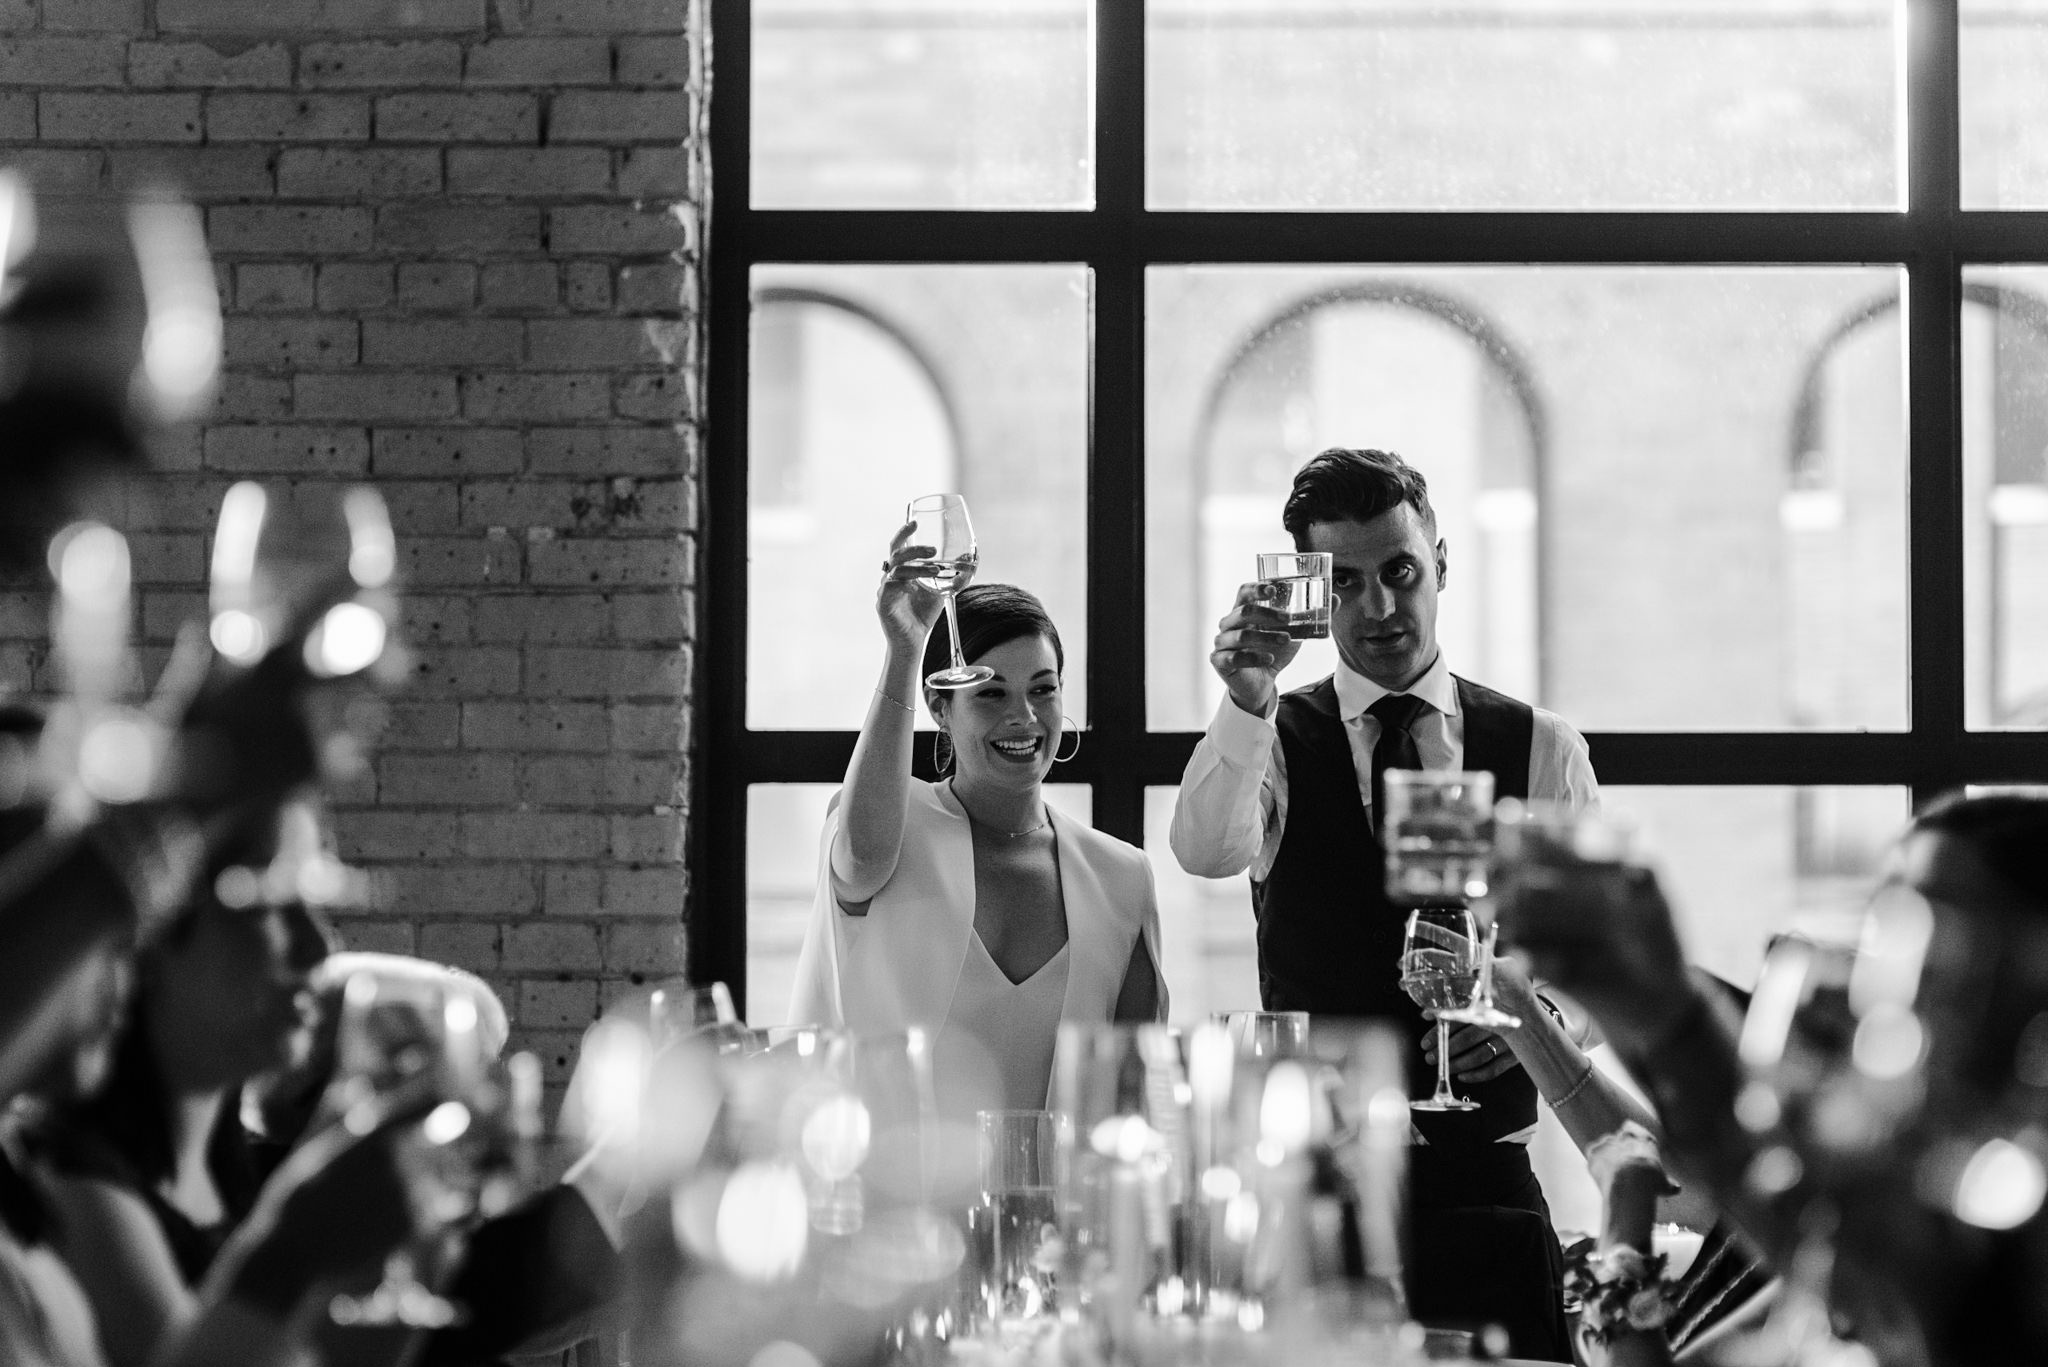 074-guests-candids-documentary-wedding-photographer-reception-storys-toronto.jpg